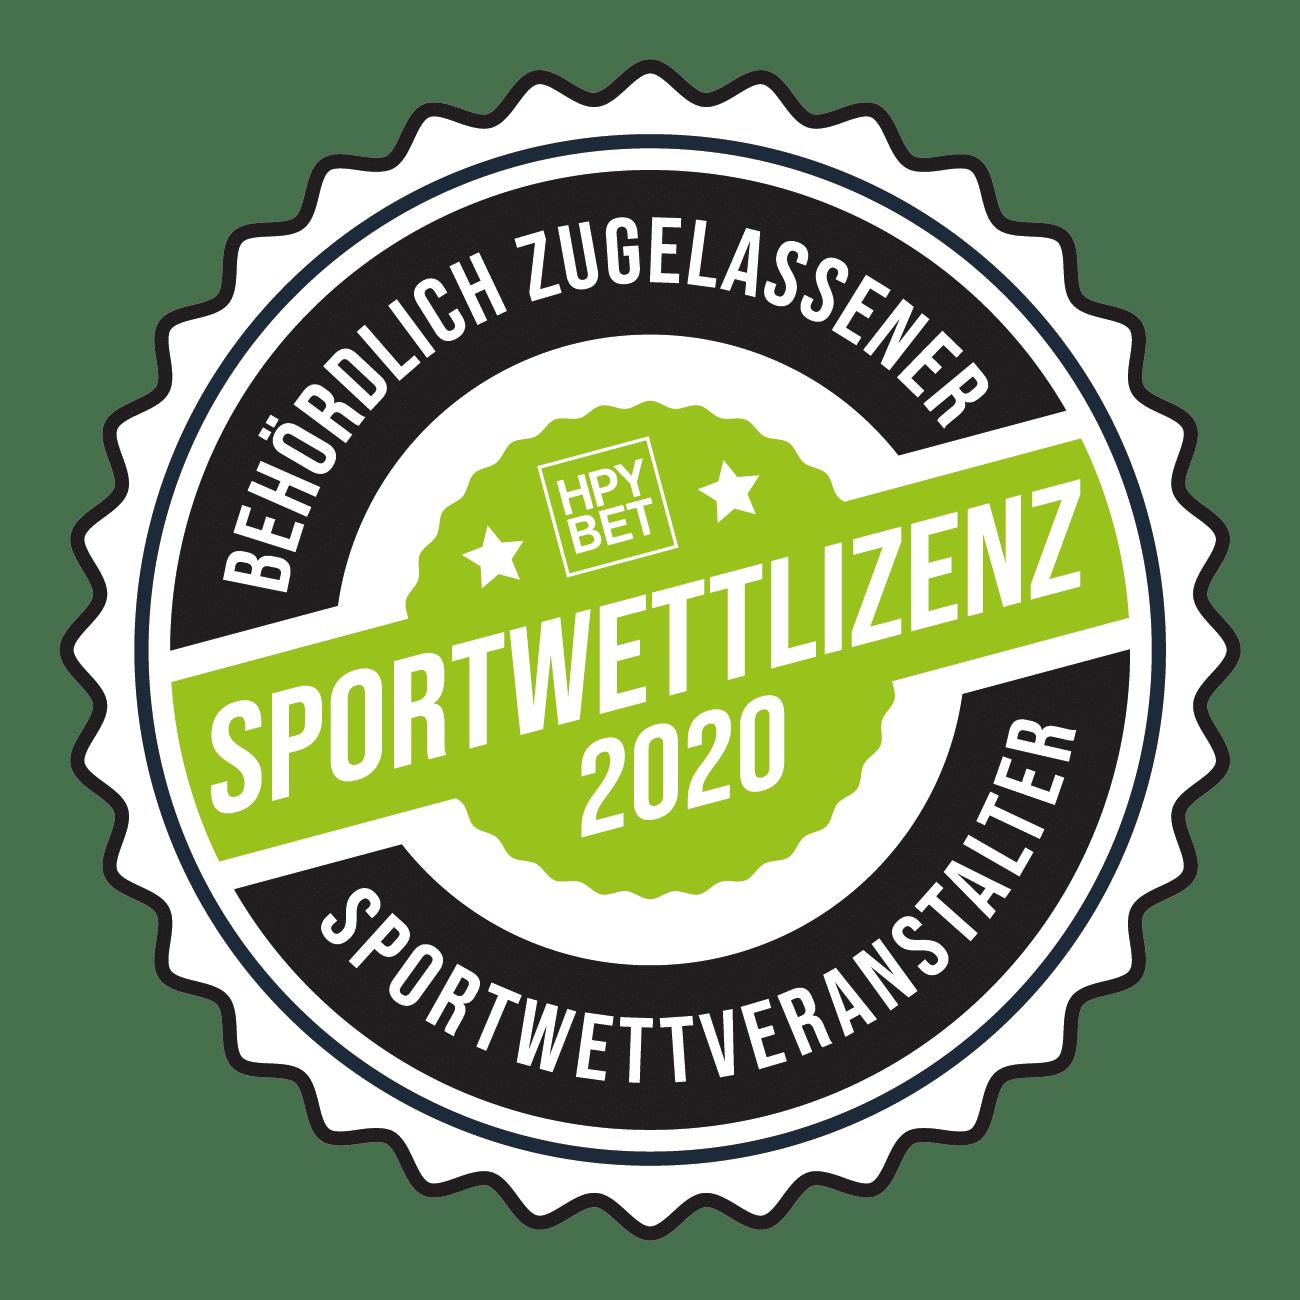 HPYBET Sportwetten Franchise